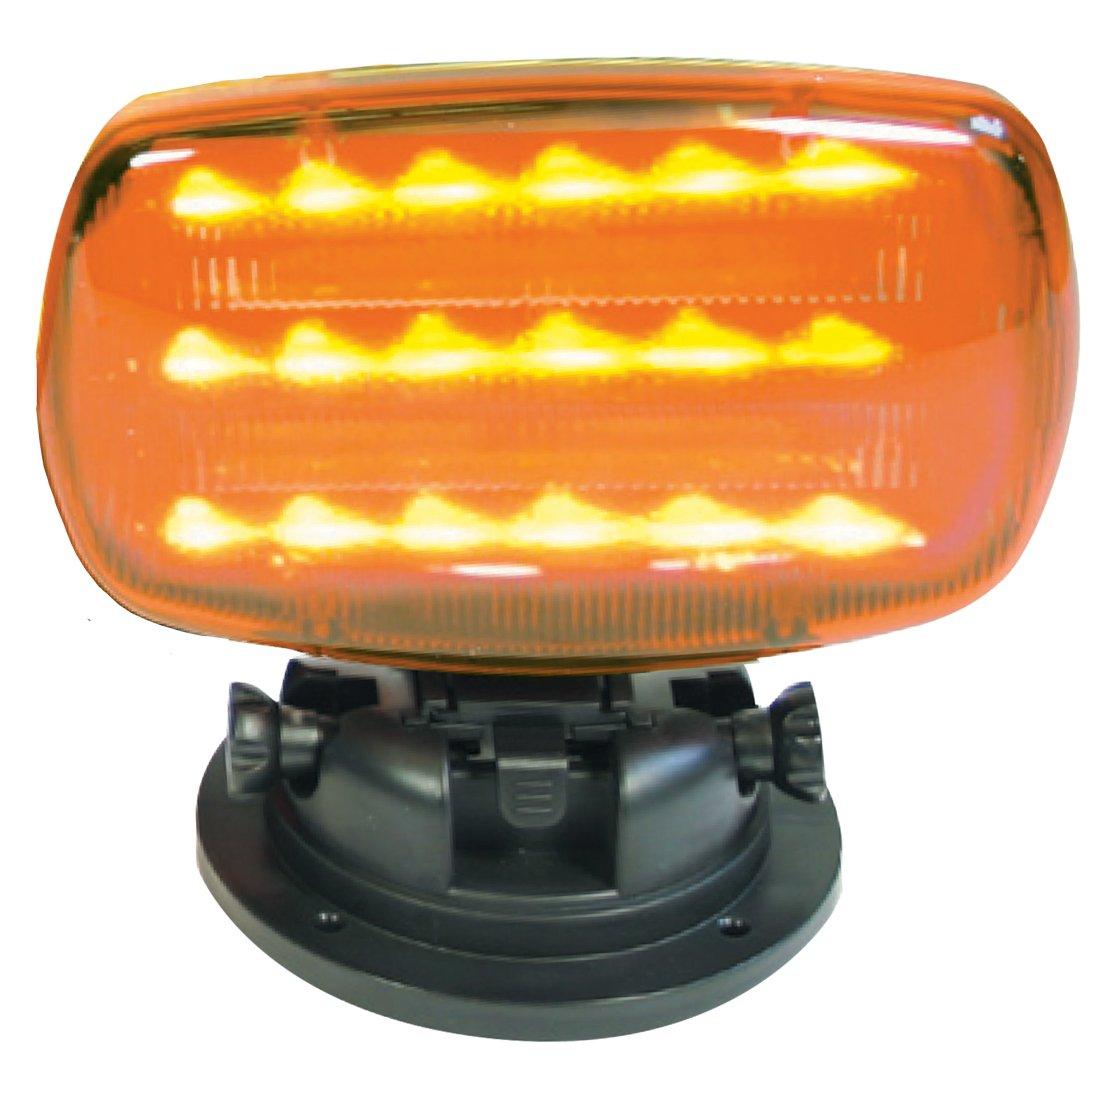 Mag. LED Flasher Amber (H.D. tilt base) Custer Products